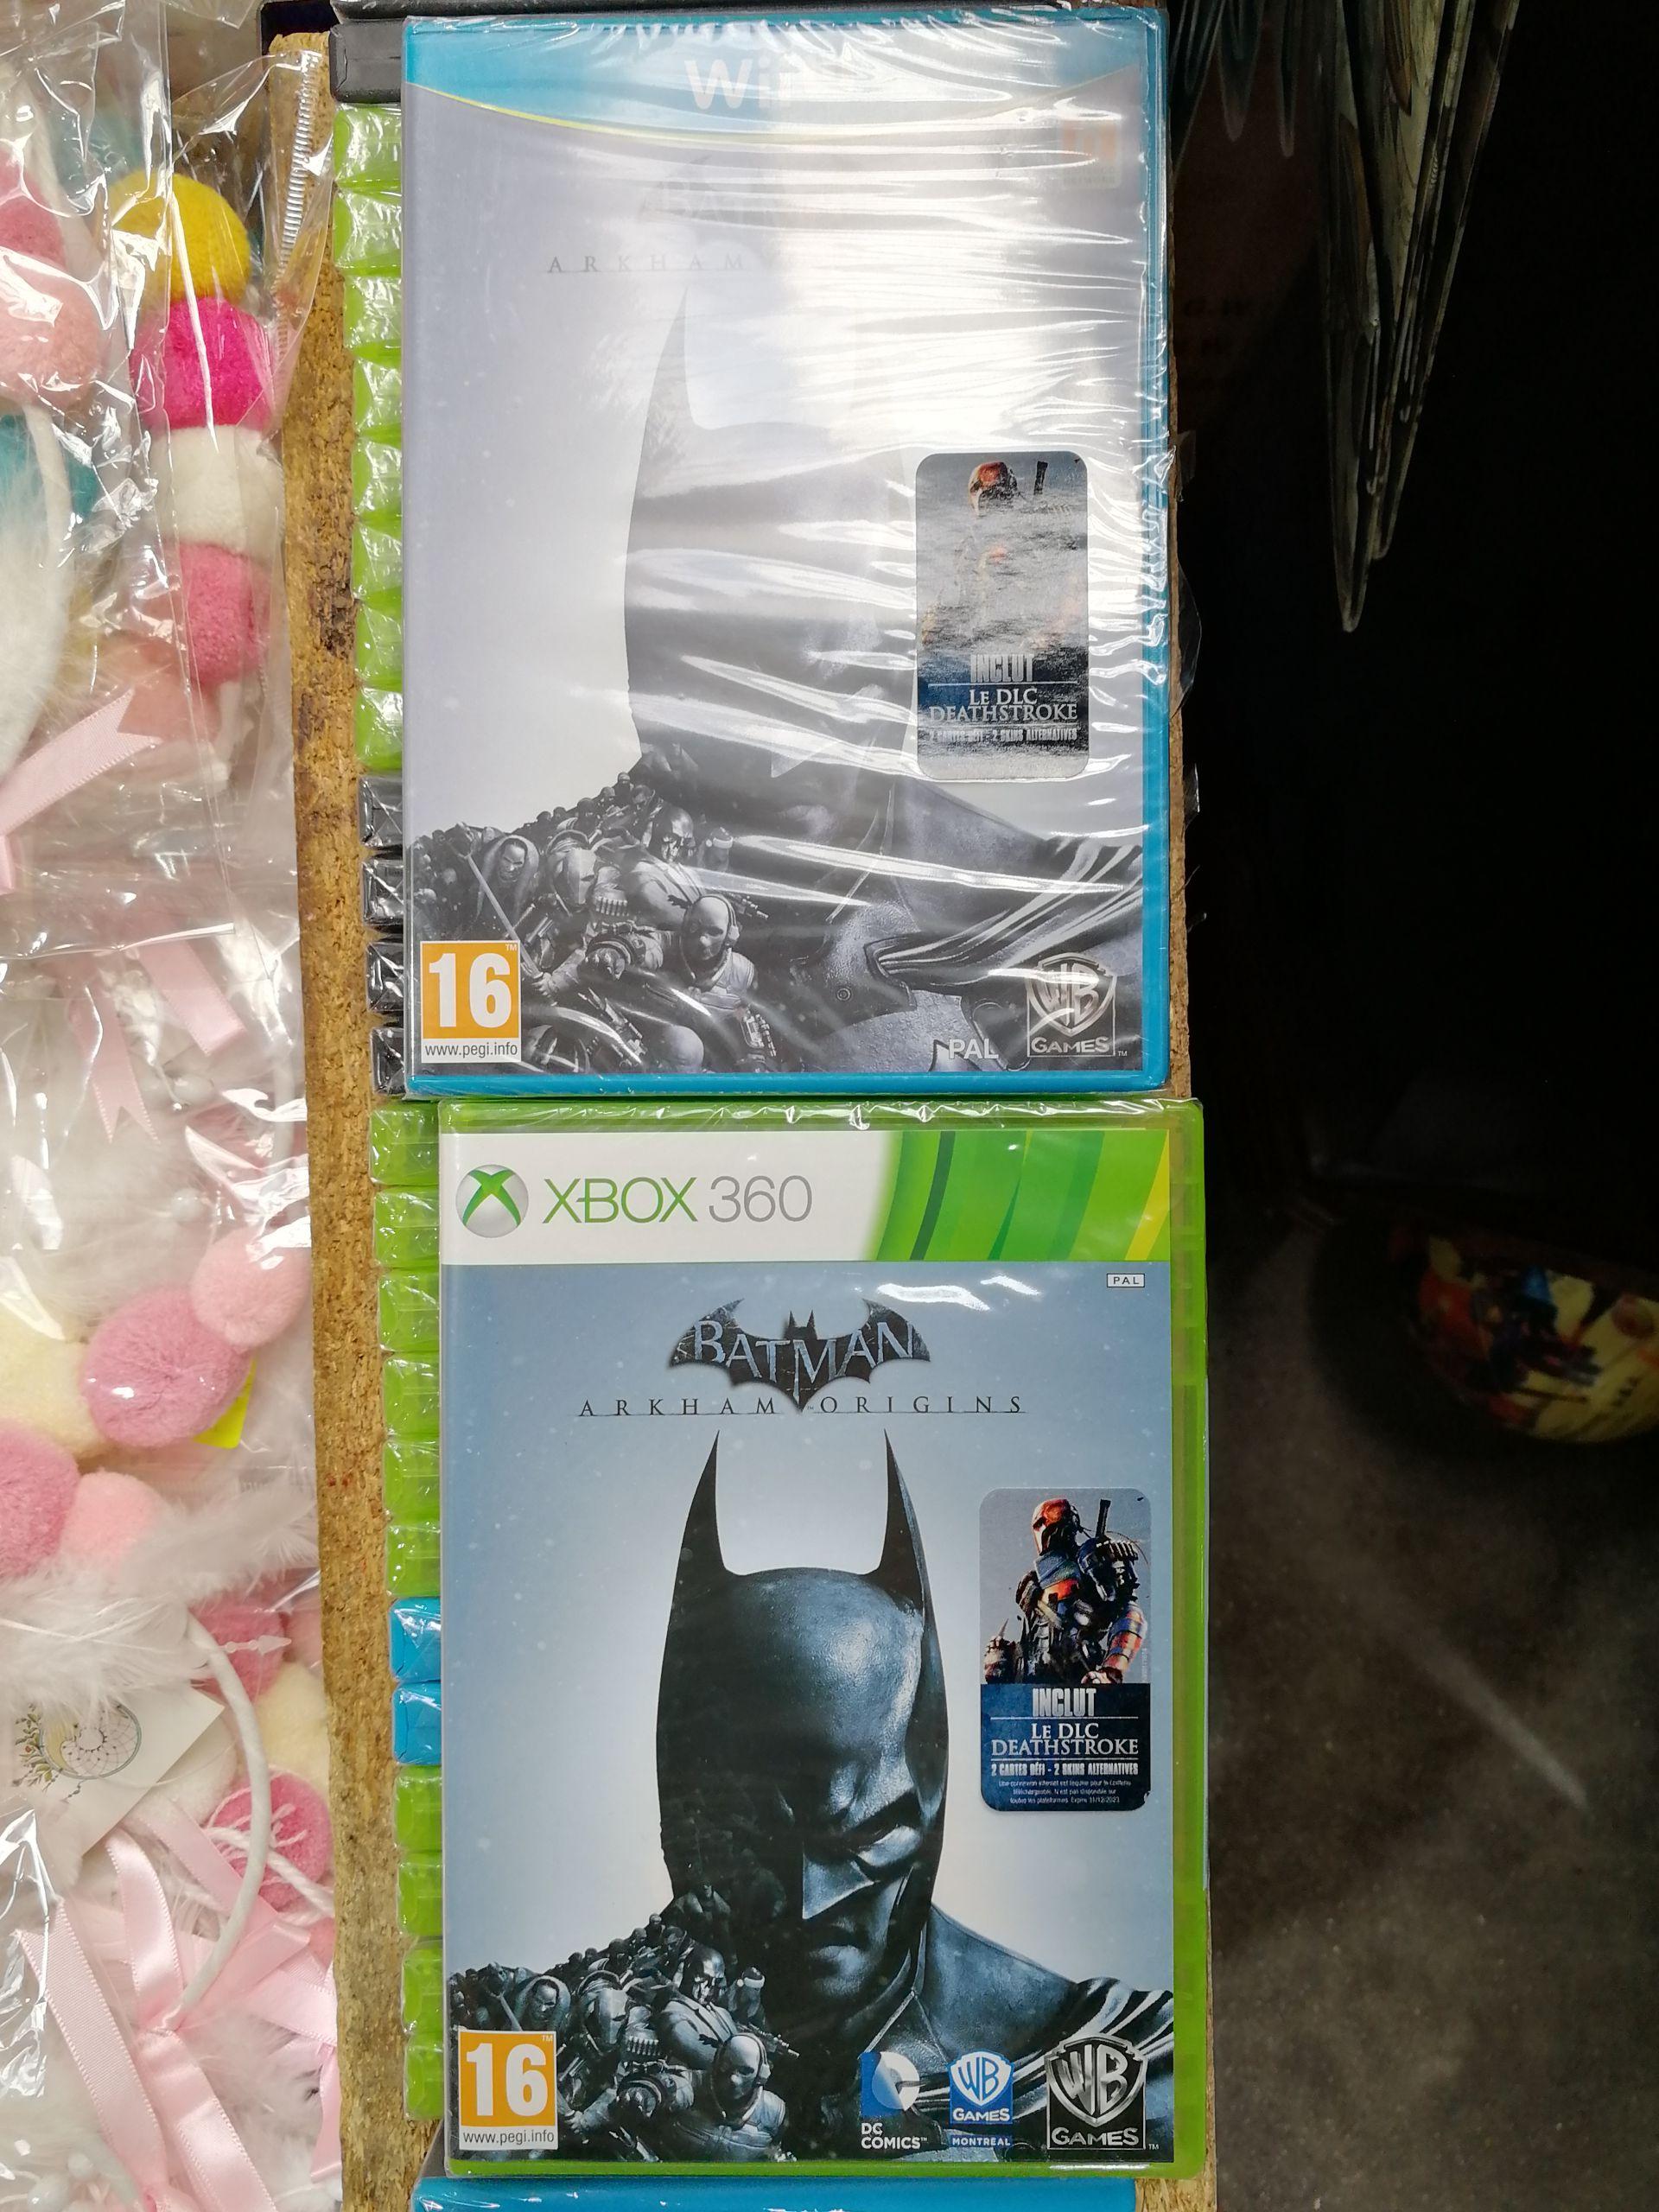 Batman Arkham Origins sur Xbox 360 ou Wii U - Capinghem (59)